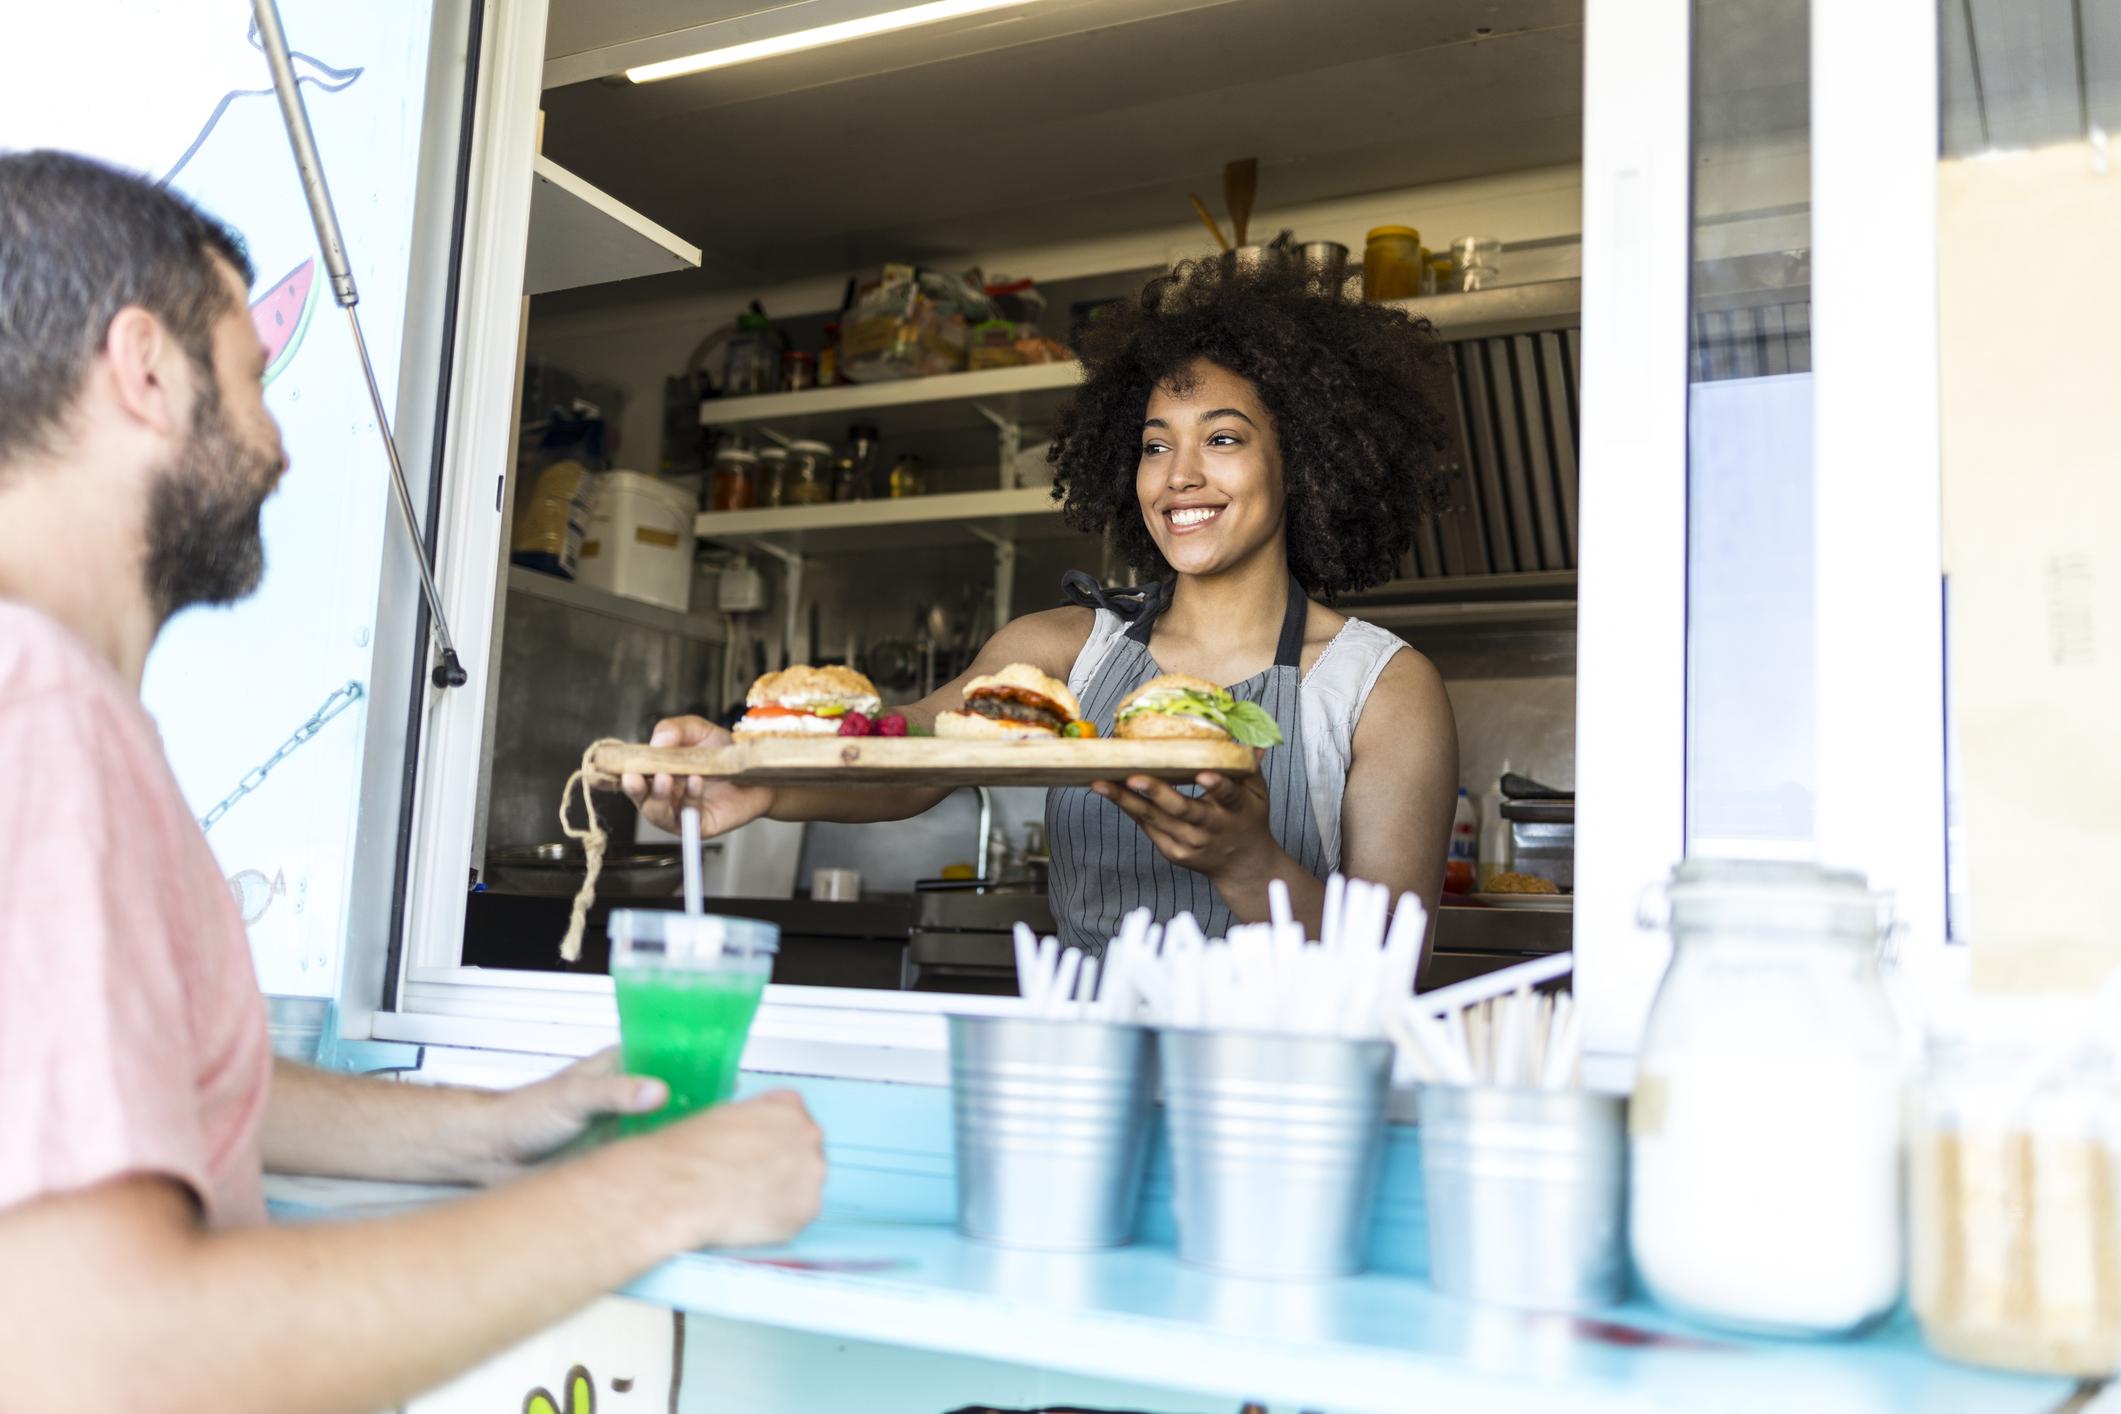 Tourist taking burgers from food van